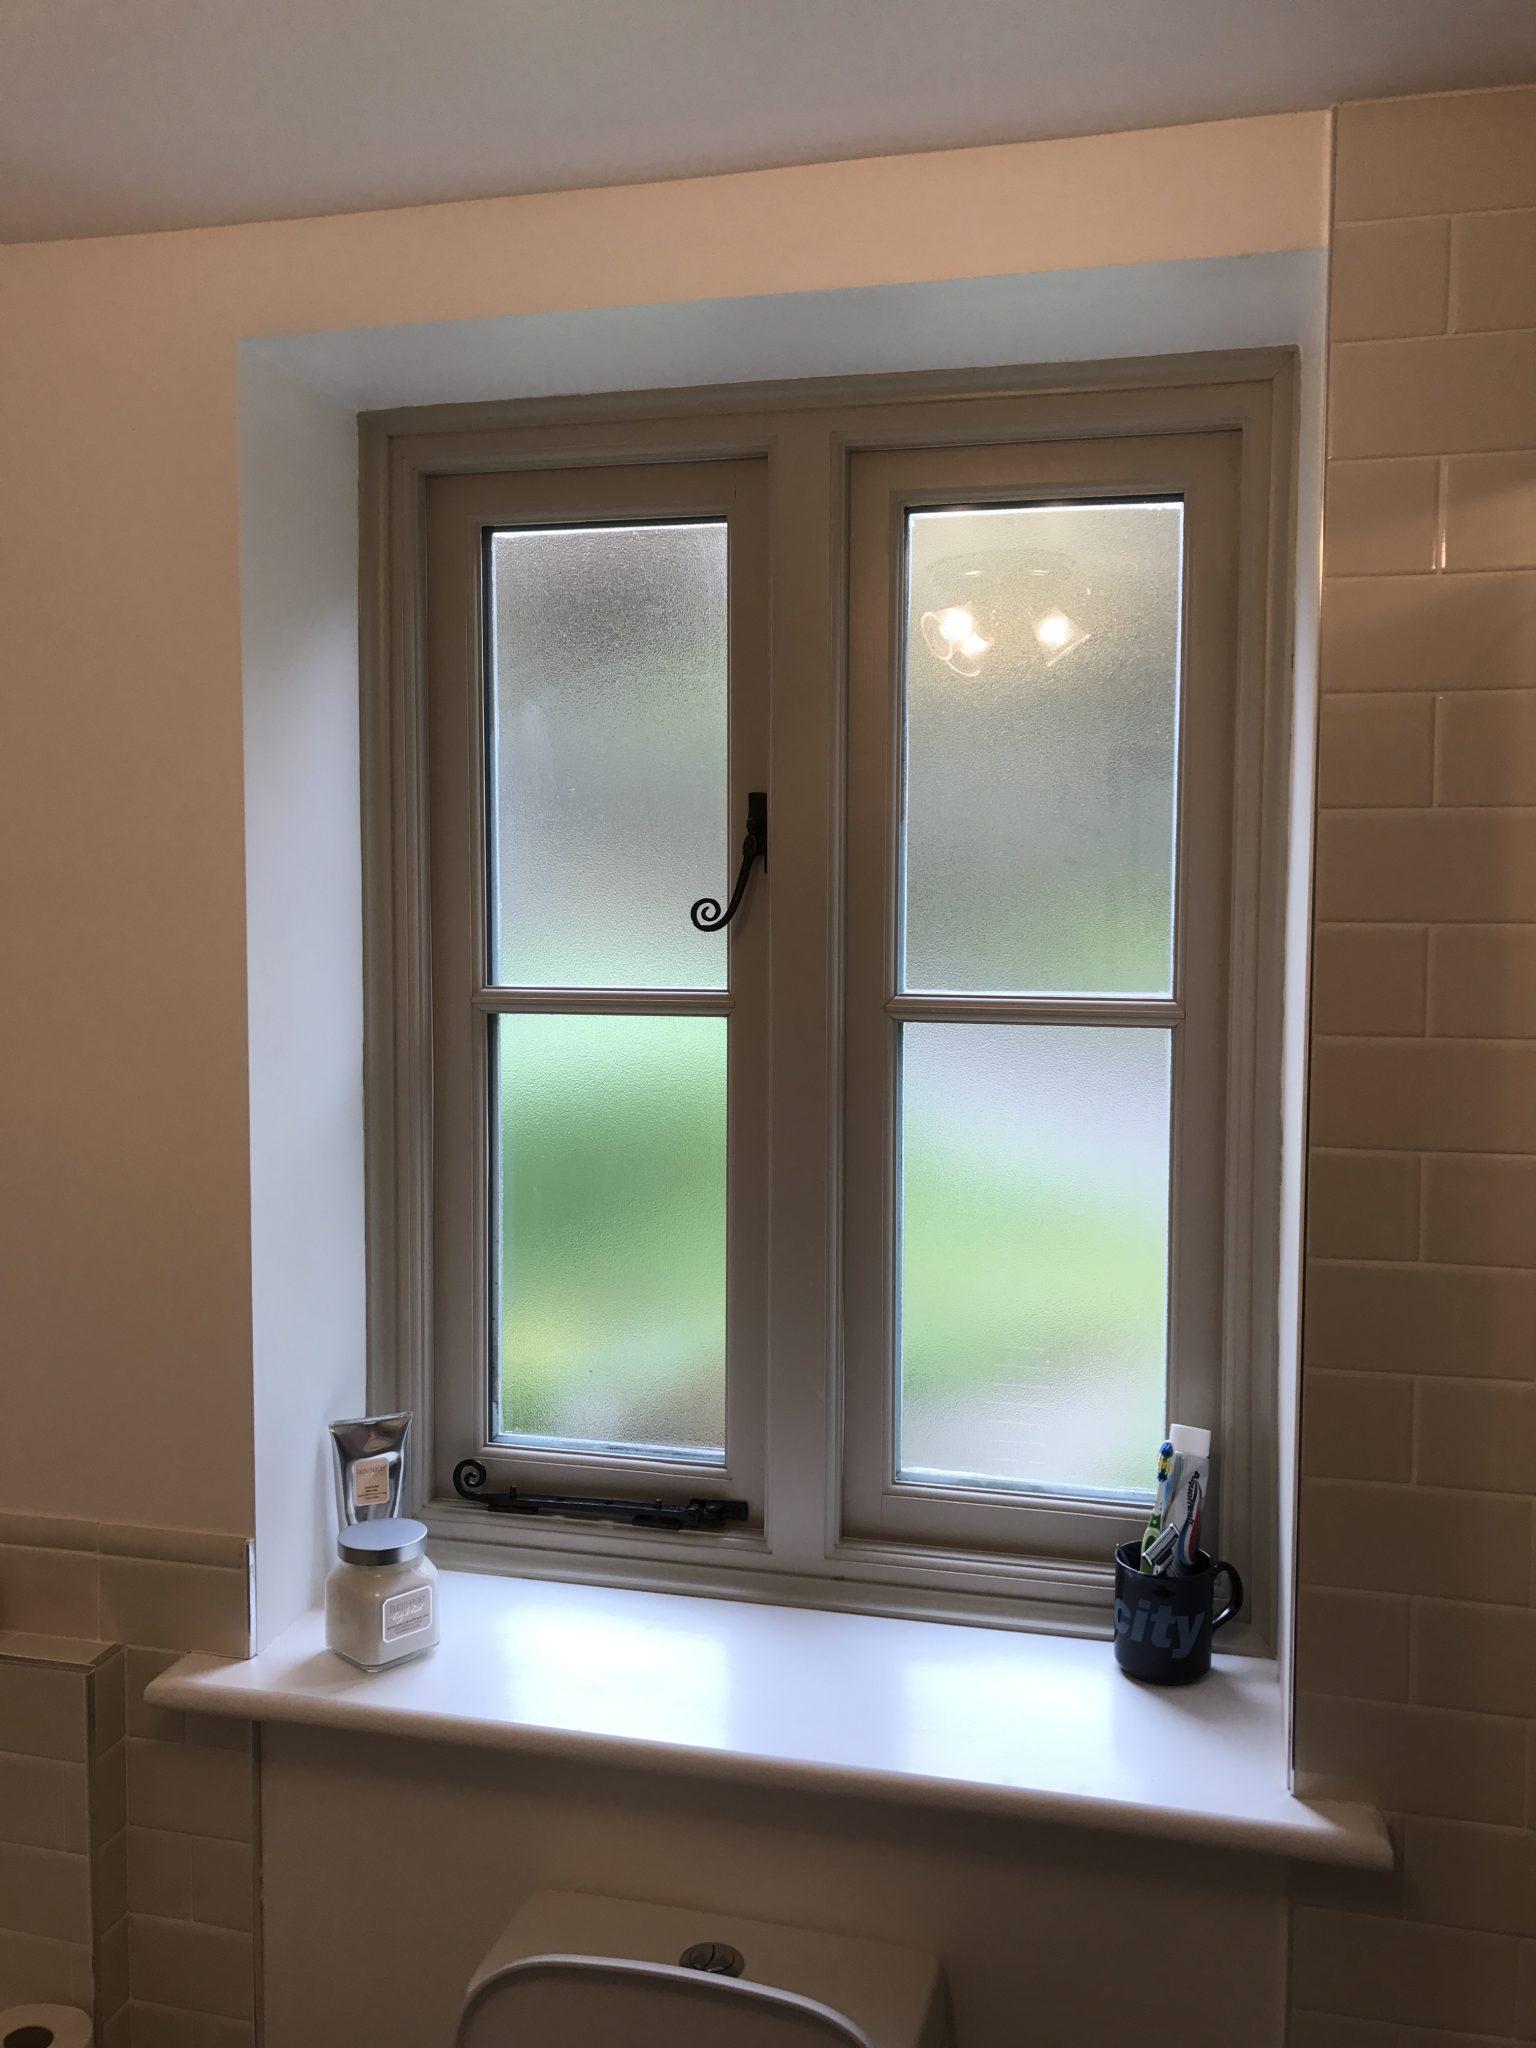 1_bespoke-bathroom-windows